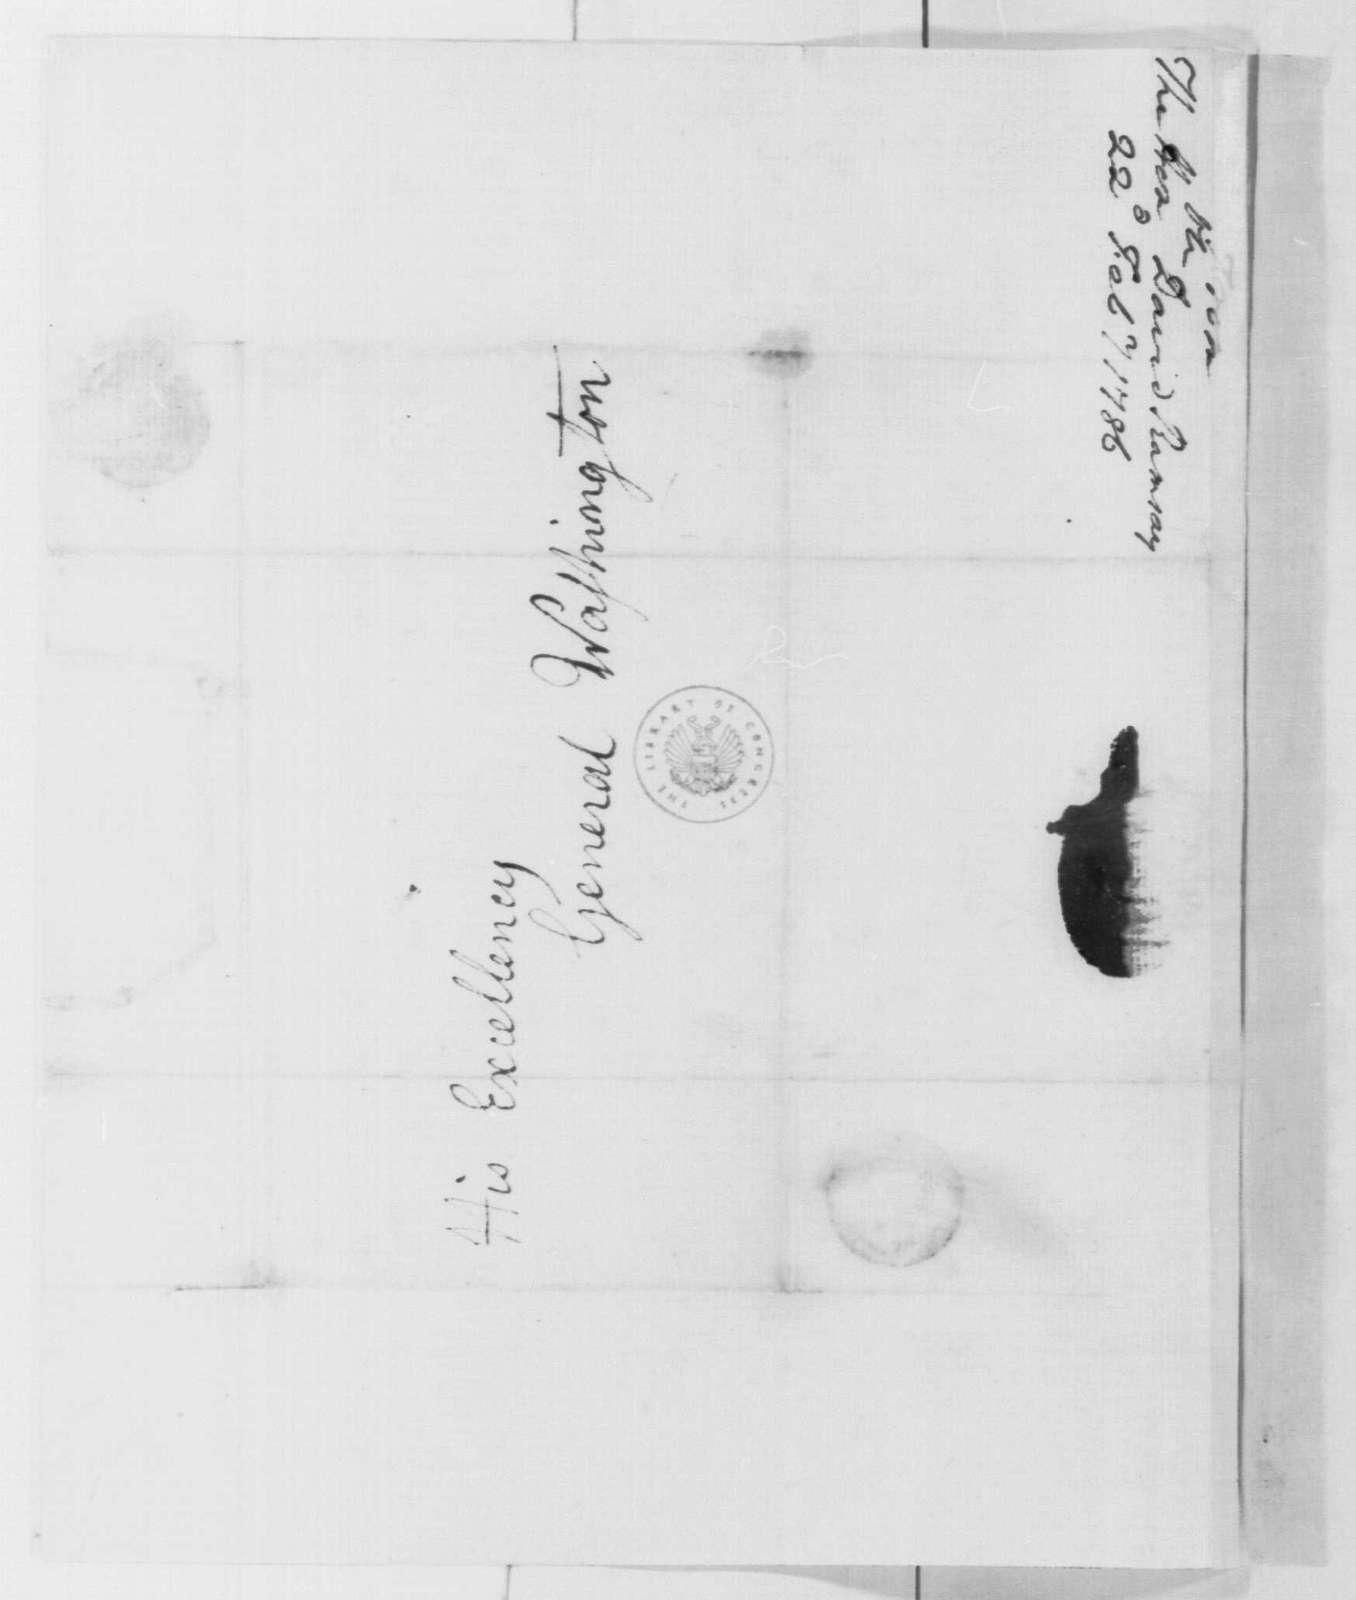 George Washington Papers, Series 4, General Correspondence: David Ramsay to George Washington, February 22, 1786